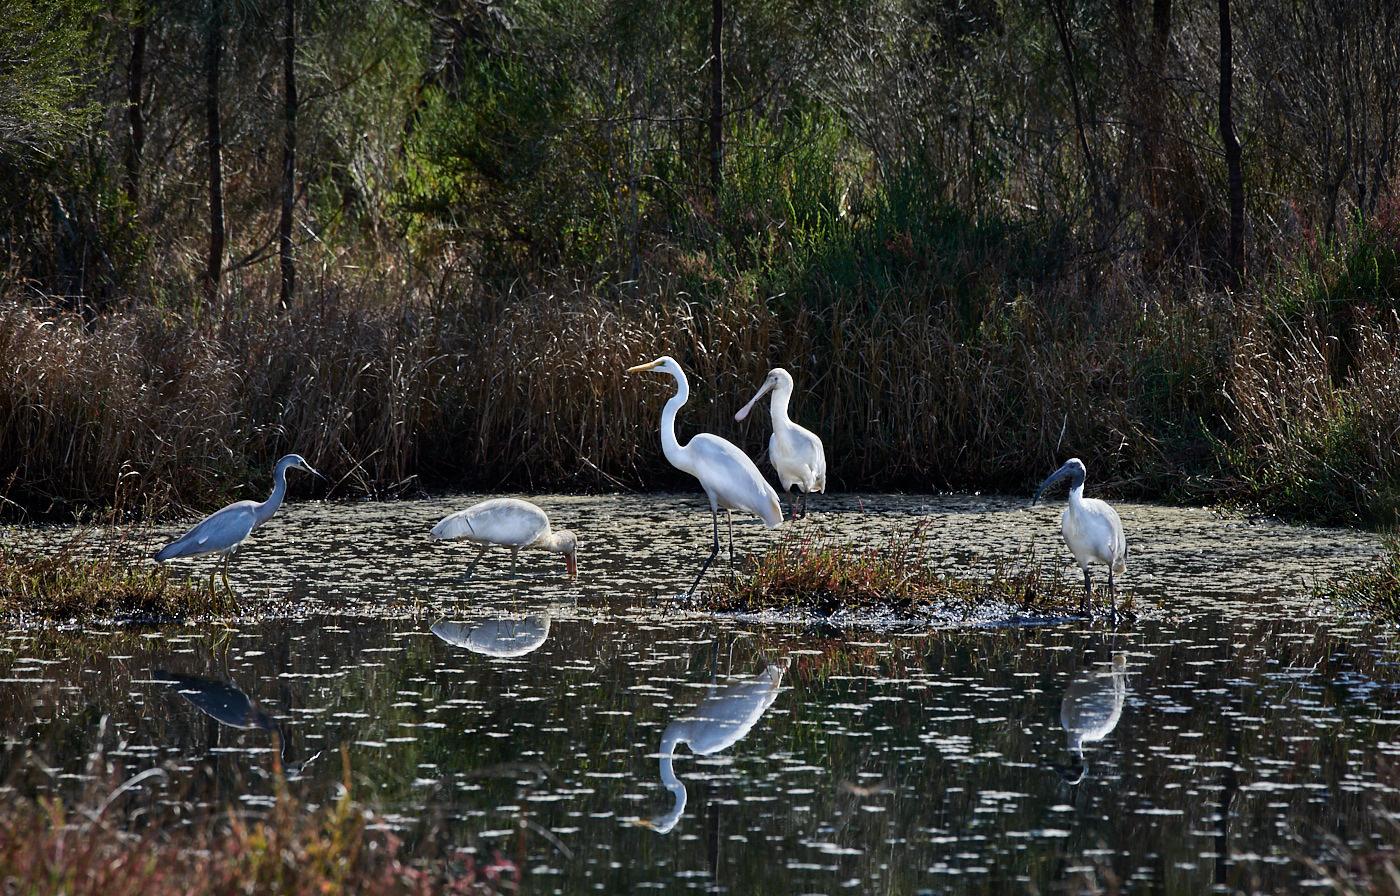 Australian White Ibis, Great Egret, White-faced Heron, Yellow-billed Spoonbill